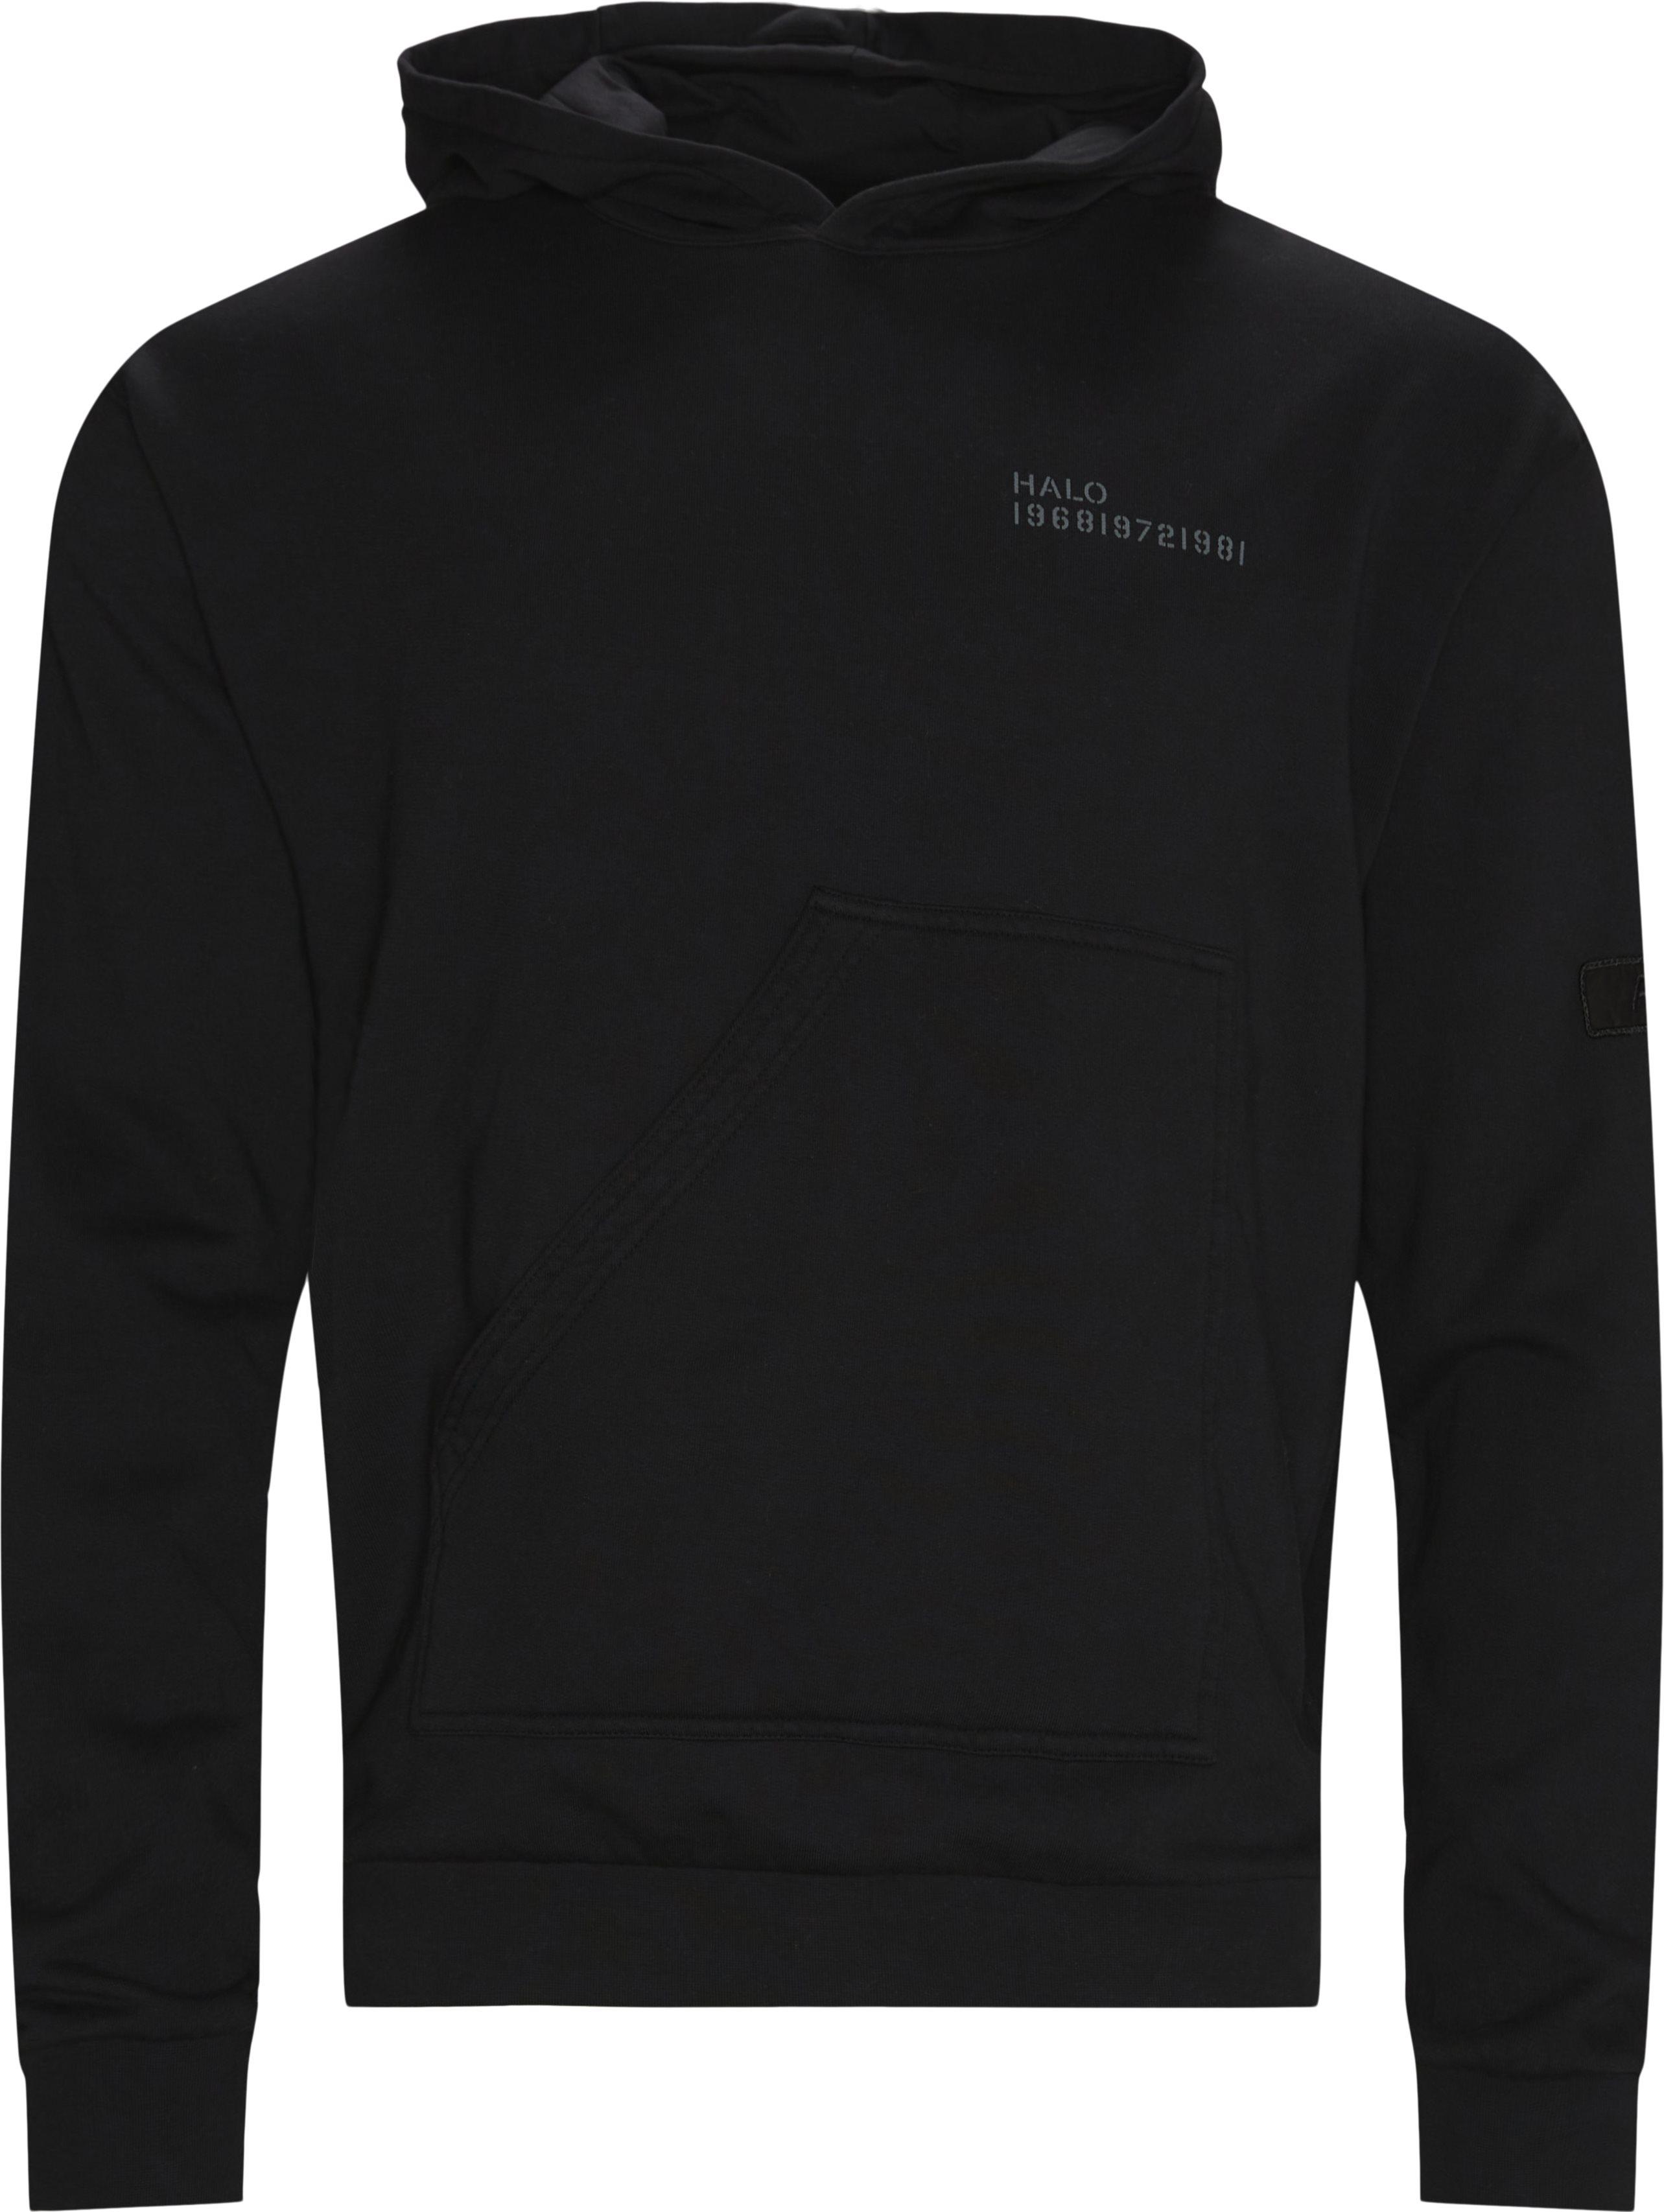 Cotton Hoodie - Sweatshirts - Regular fit - Svart